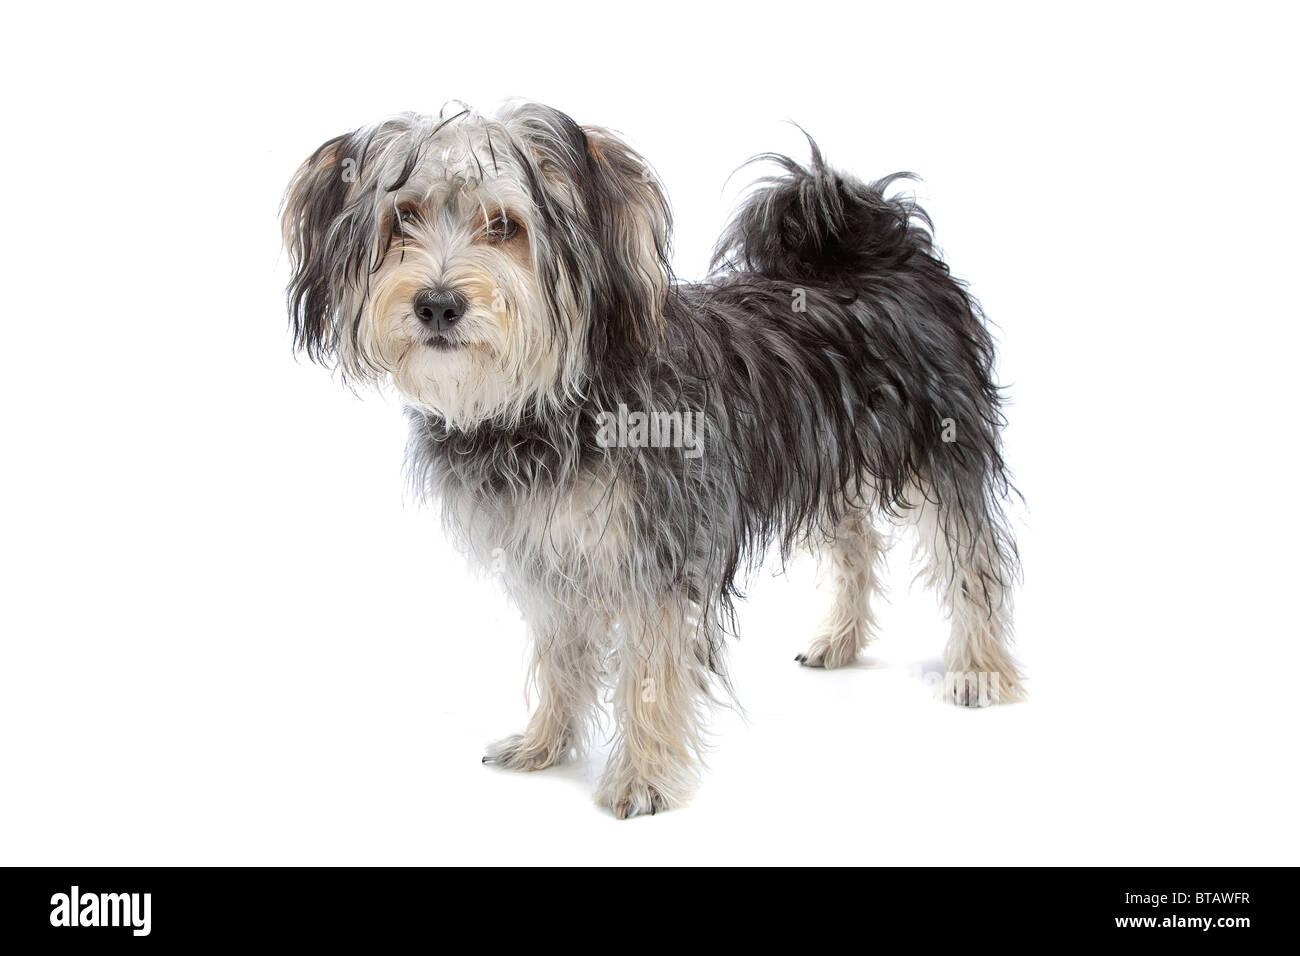 Mixed Breed Maltese Dog Yorkshire Terrier Stock Photo 32201675